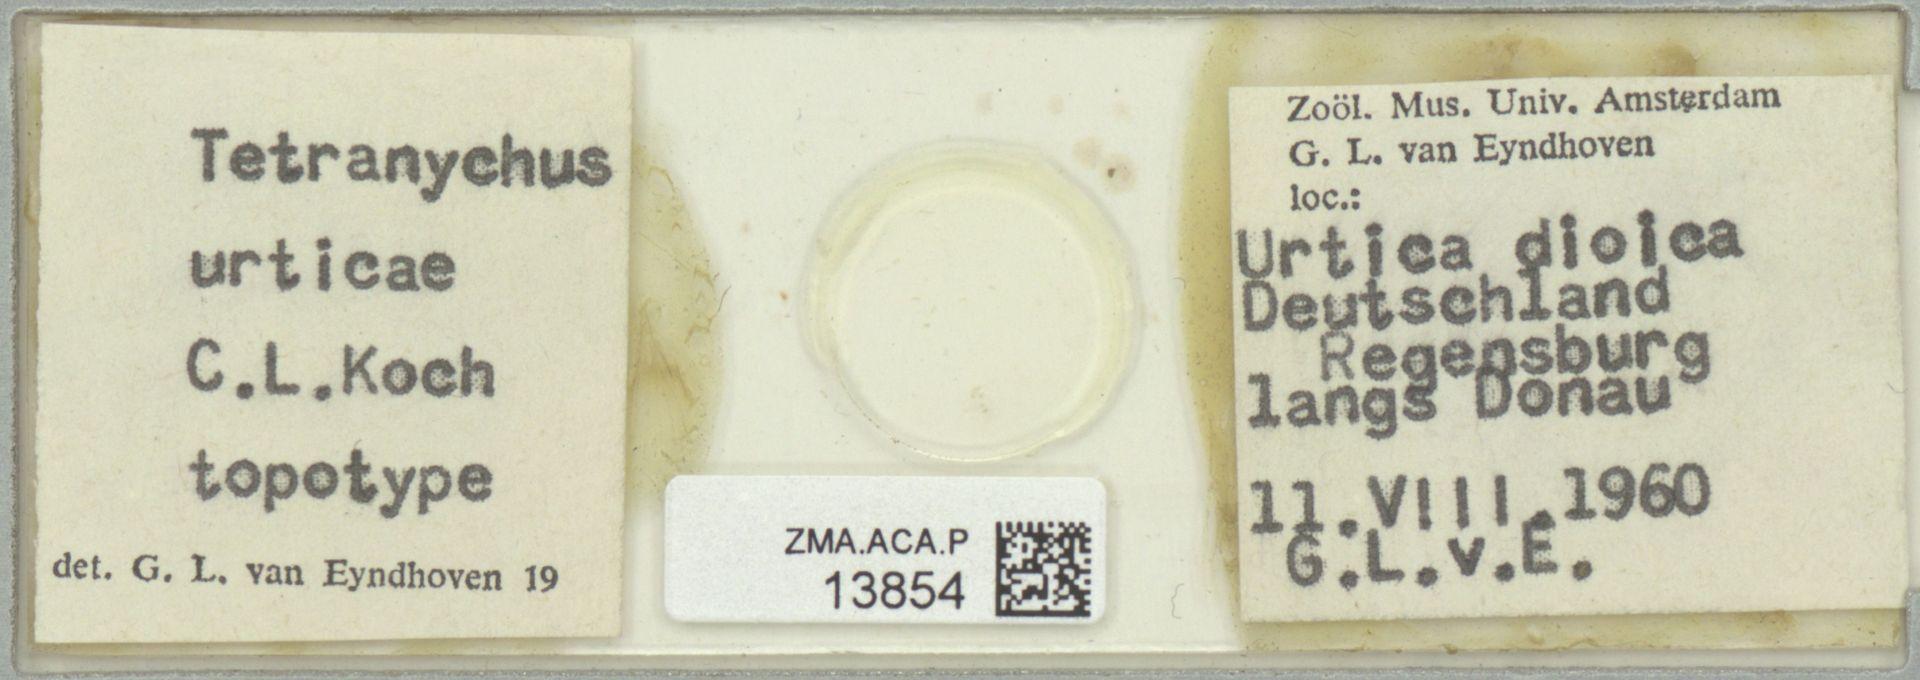 ZMA.ACA.P.13854 | Tetranychus urticae